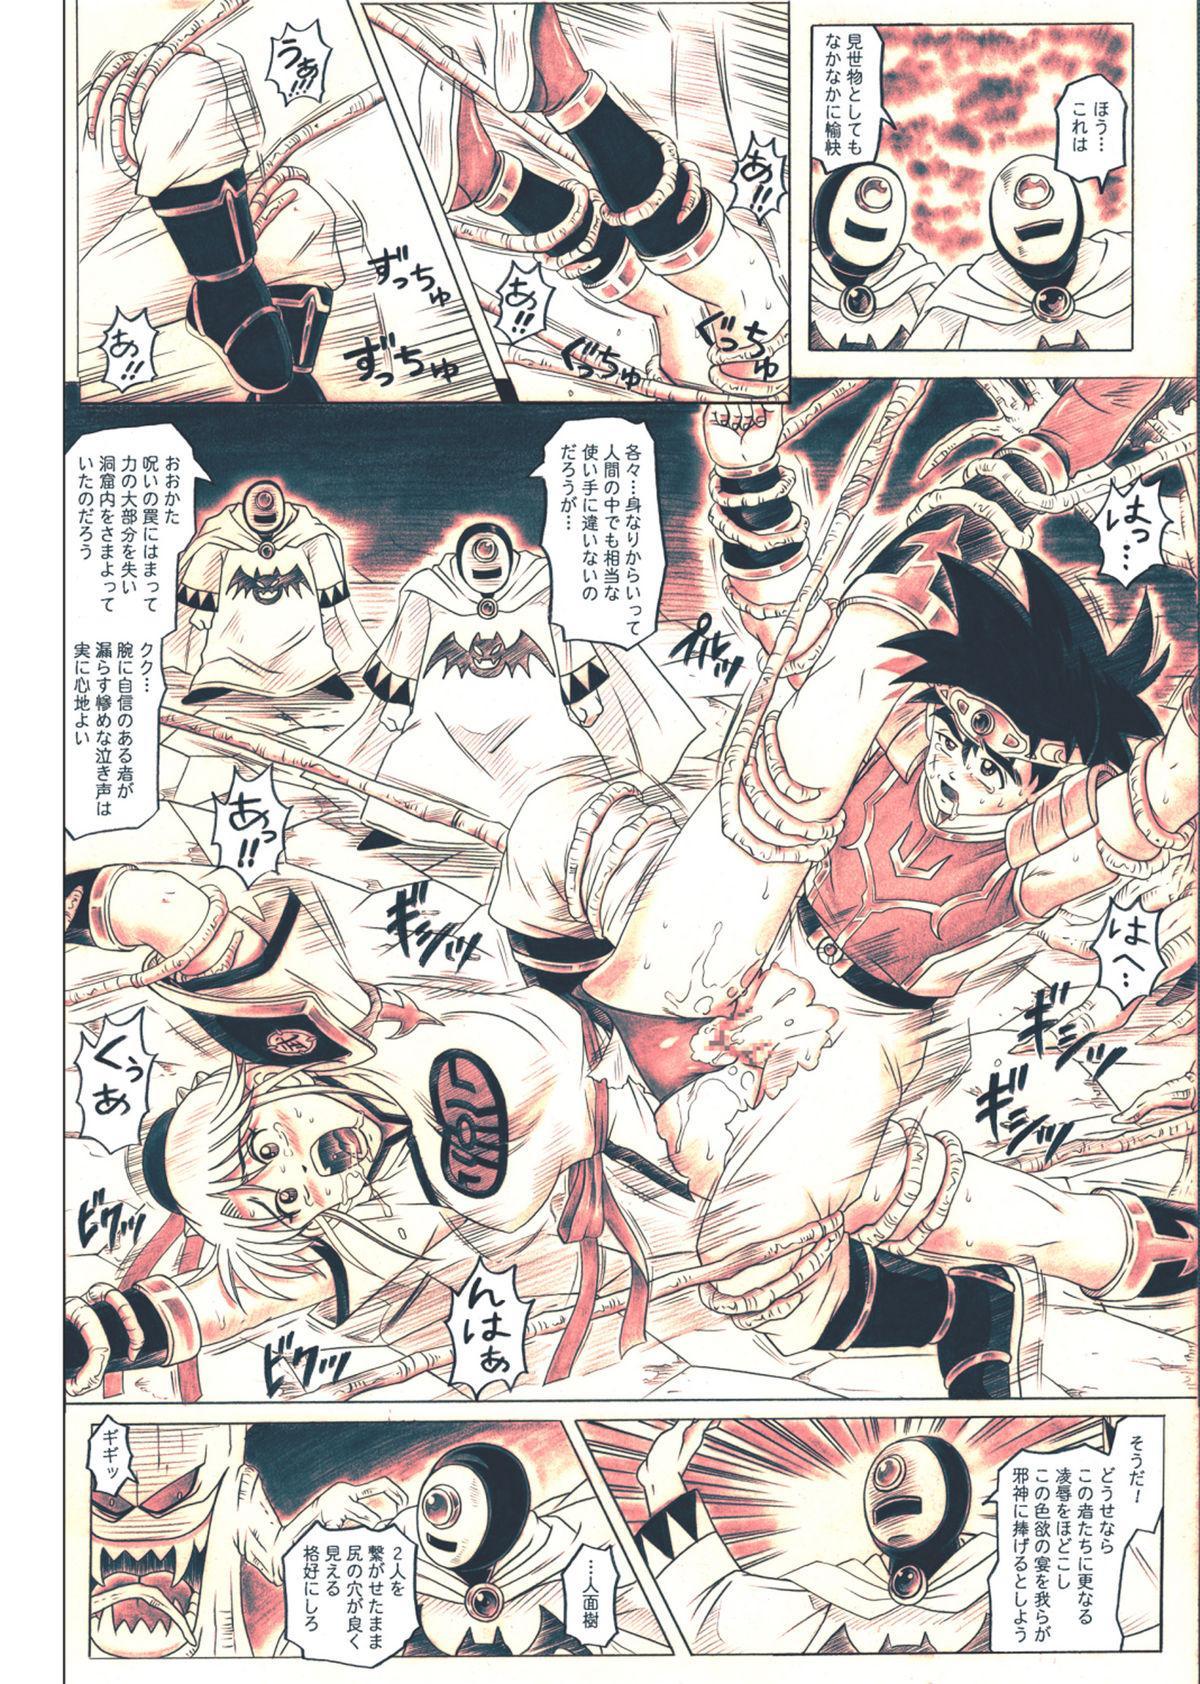 [Cyclone (Reizei, Izumi)] STAR TAC IDO ~Youkuso Haja no Doukutsu he~ Chuuhen Download edition (Dragon Warrior: Dai's Great Adventure) [Digital] 103